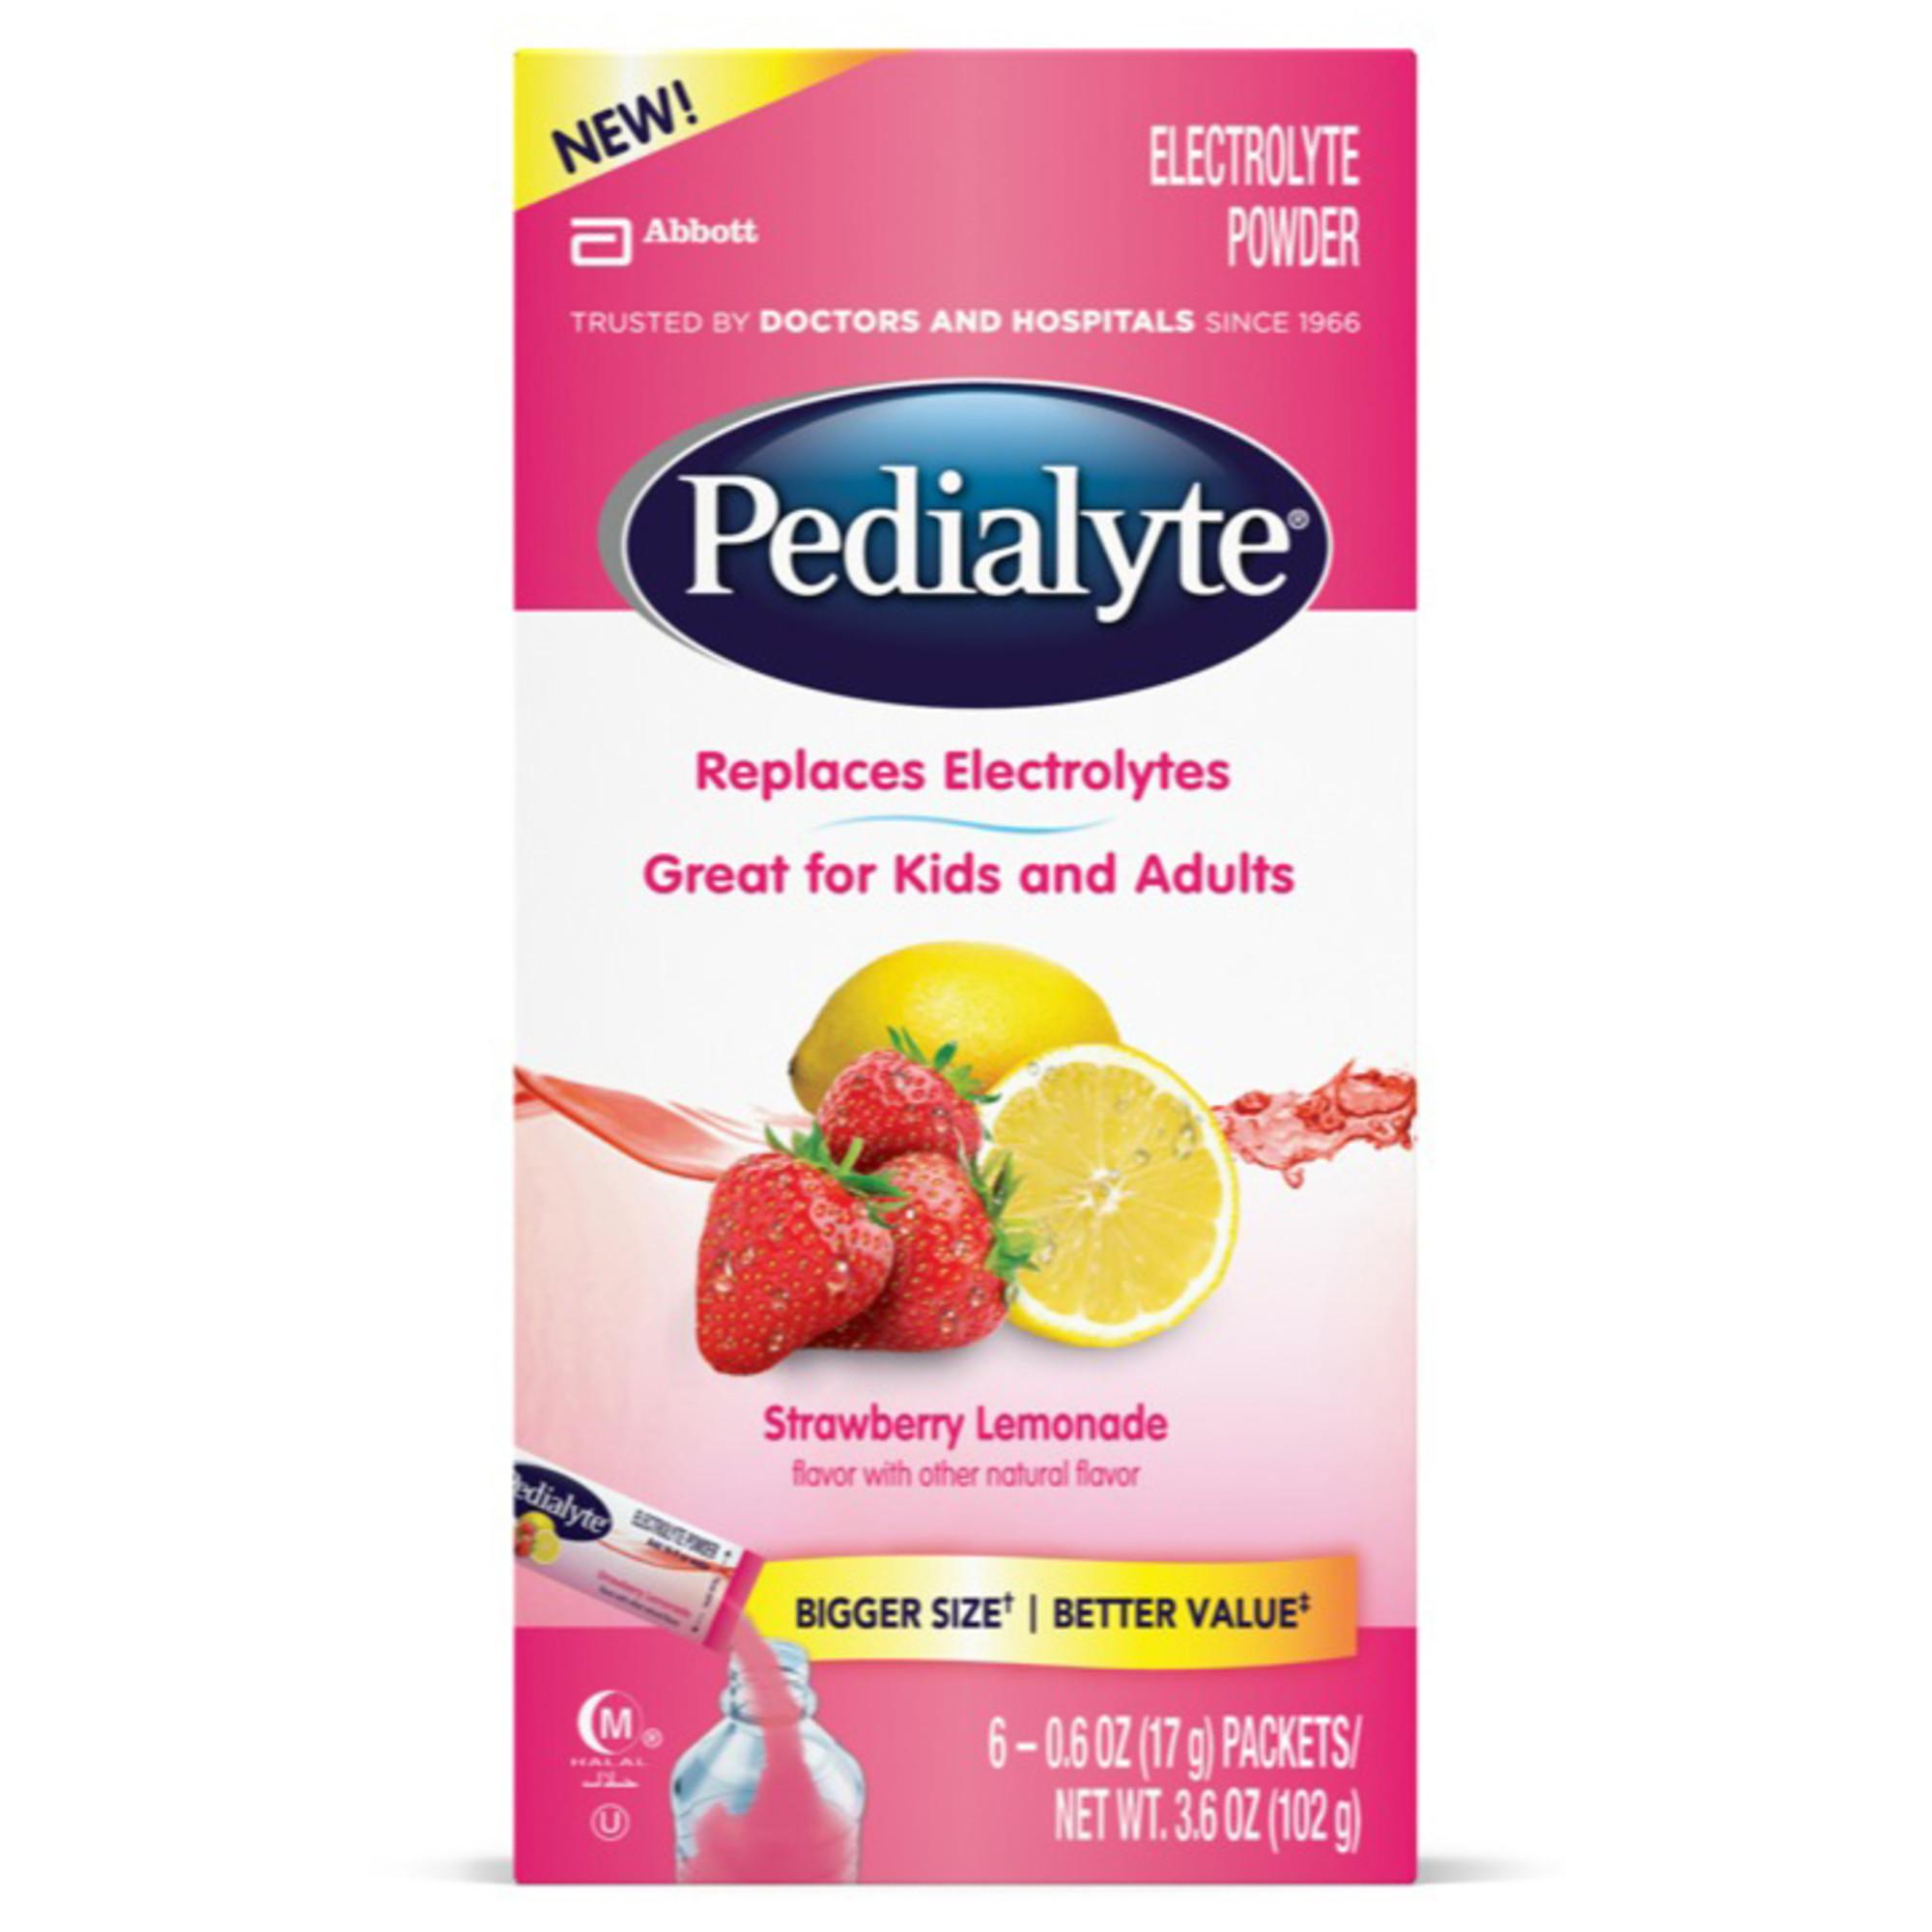 Pedialyte Electrolyte Drink Powder (6-6 Packs) Strawberry Lemonade 0.6 oz